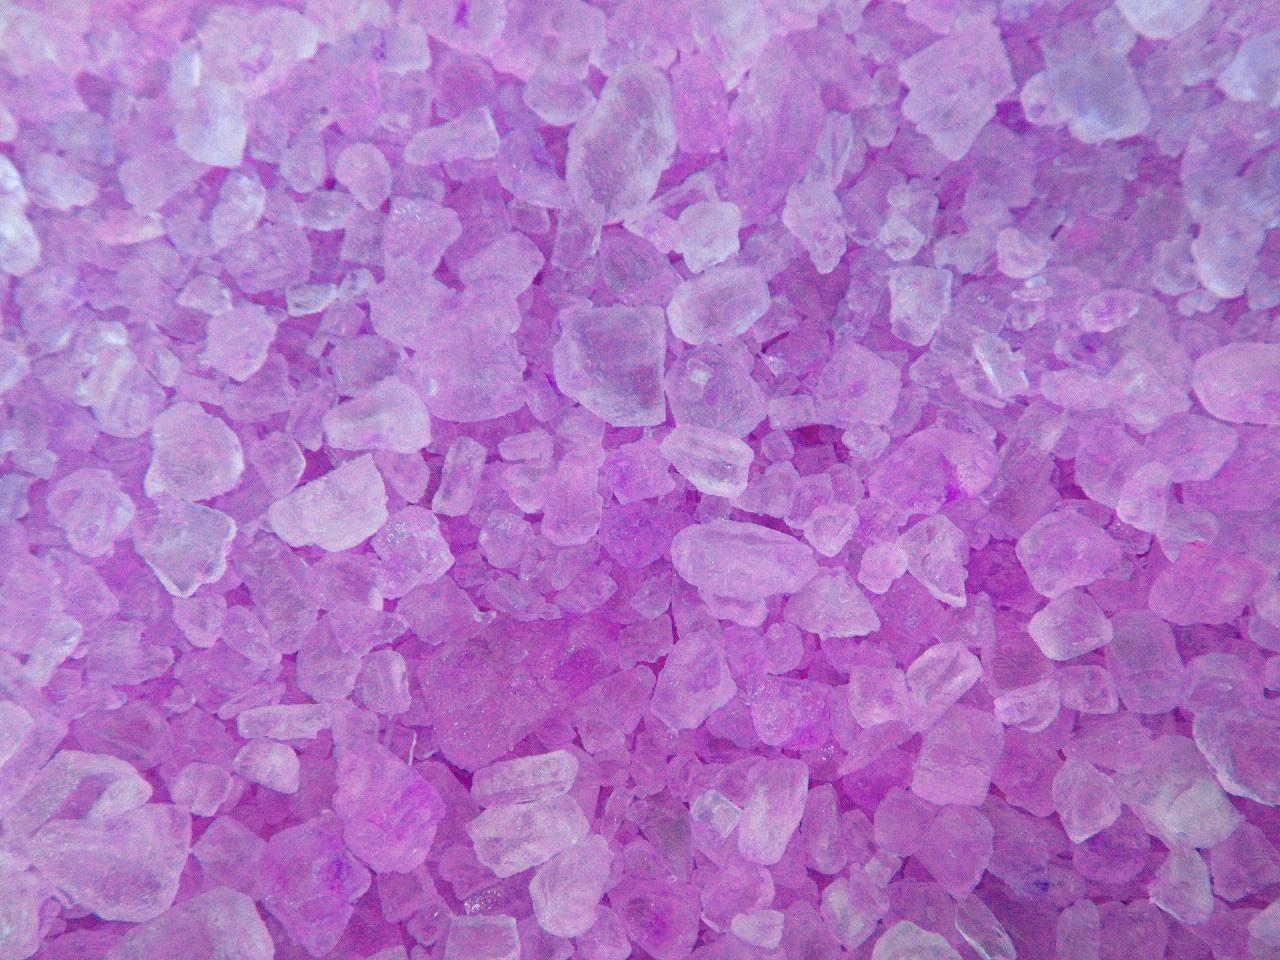 Anime Glass Wallpaper Lavender Scented Crystals Aroma Burner Com